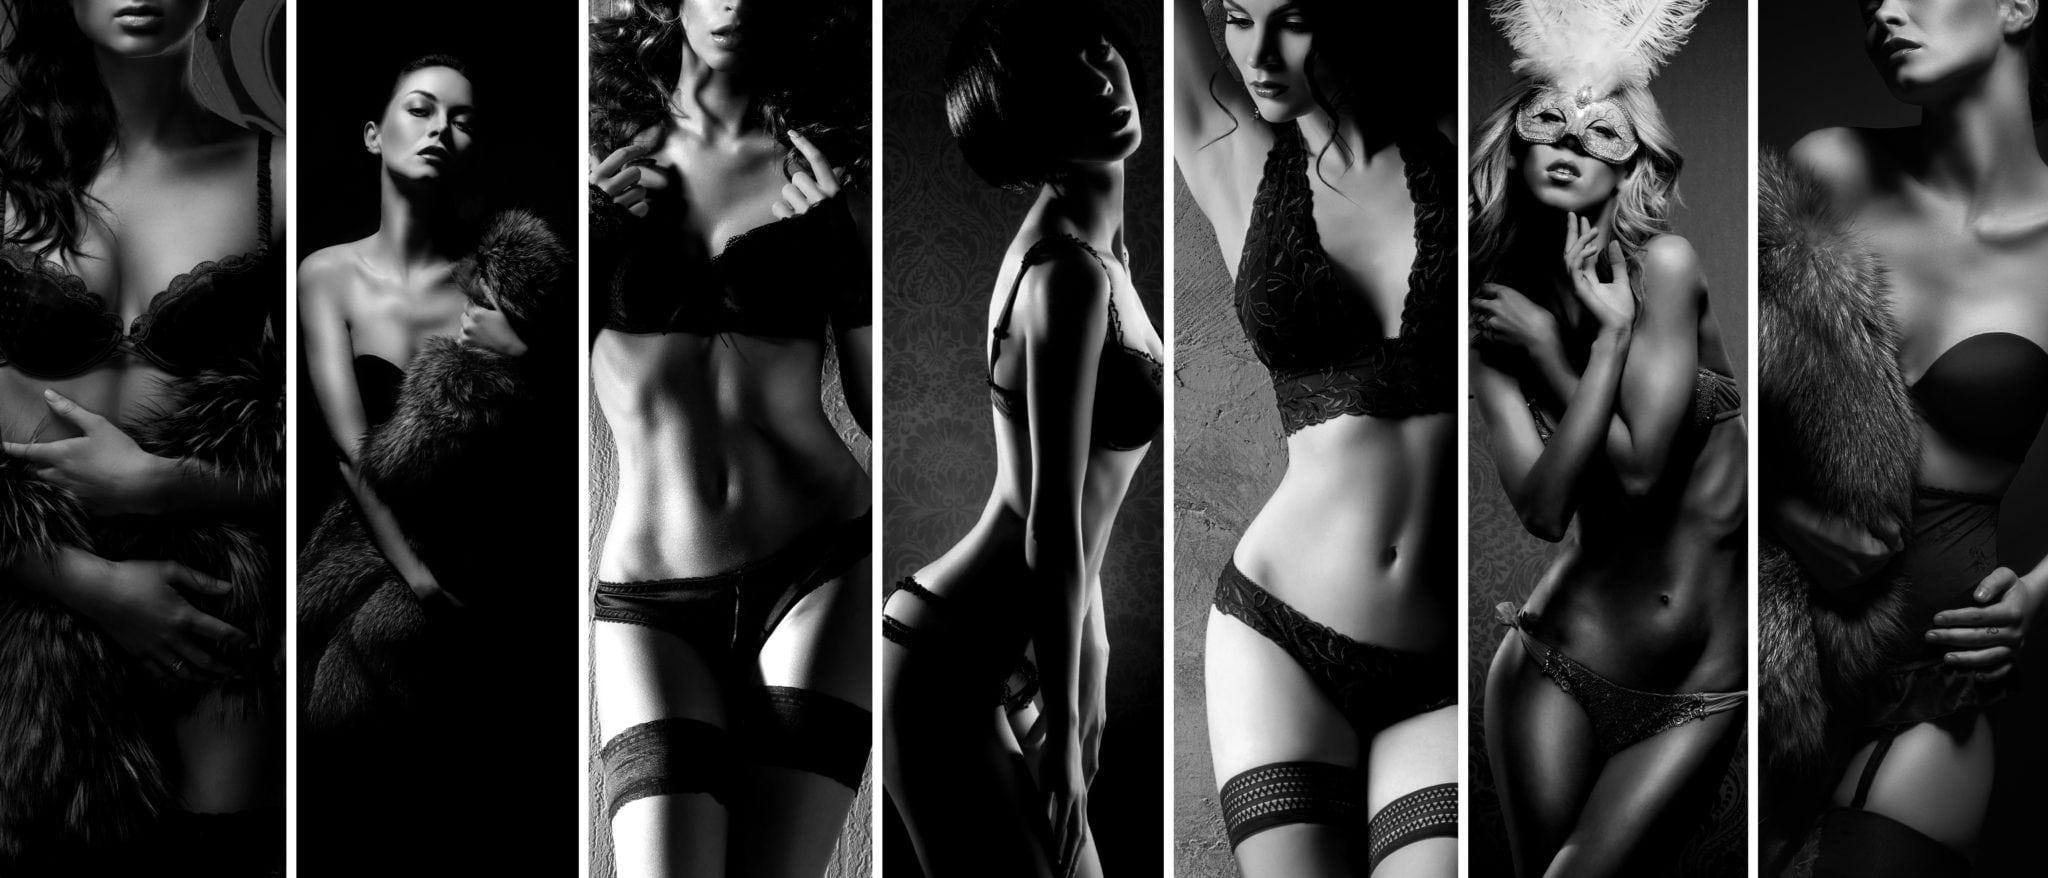 Breckenridge Strippers, Breckenridge Female Strippers, Breckenridge Male Strippers, Female Strippers, Male Strippers, Aspen Strippers, Boobs, Lesbian, Girl, Female Strippers, Strippers, Male Strippers, Aspen Strippers, Aspen Female Strippers, Aspen Male Strippers, Exotic Dancer, Black Strippers. Aspen Colorado, Aspen, strippers, Vail, Colorado, springs, party, hotter, parties, service, fort, aspen vail, vail strippers, black hawk, fort collins, colorado springs, exotic dancer, steamboat springs, aspen vail strippers.